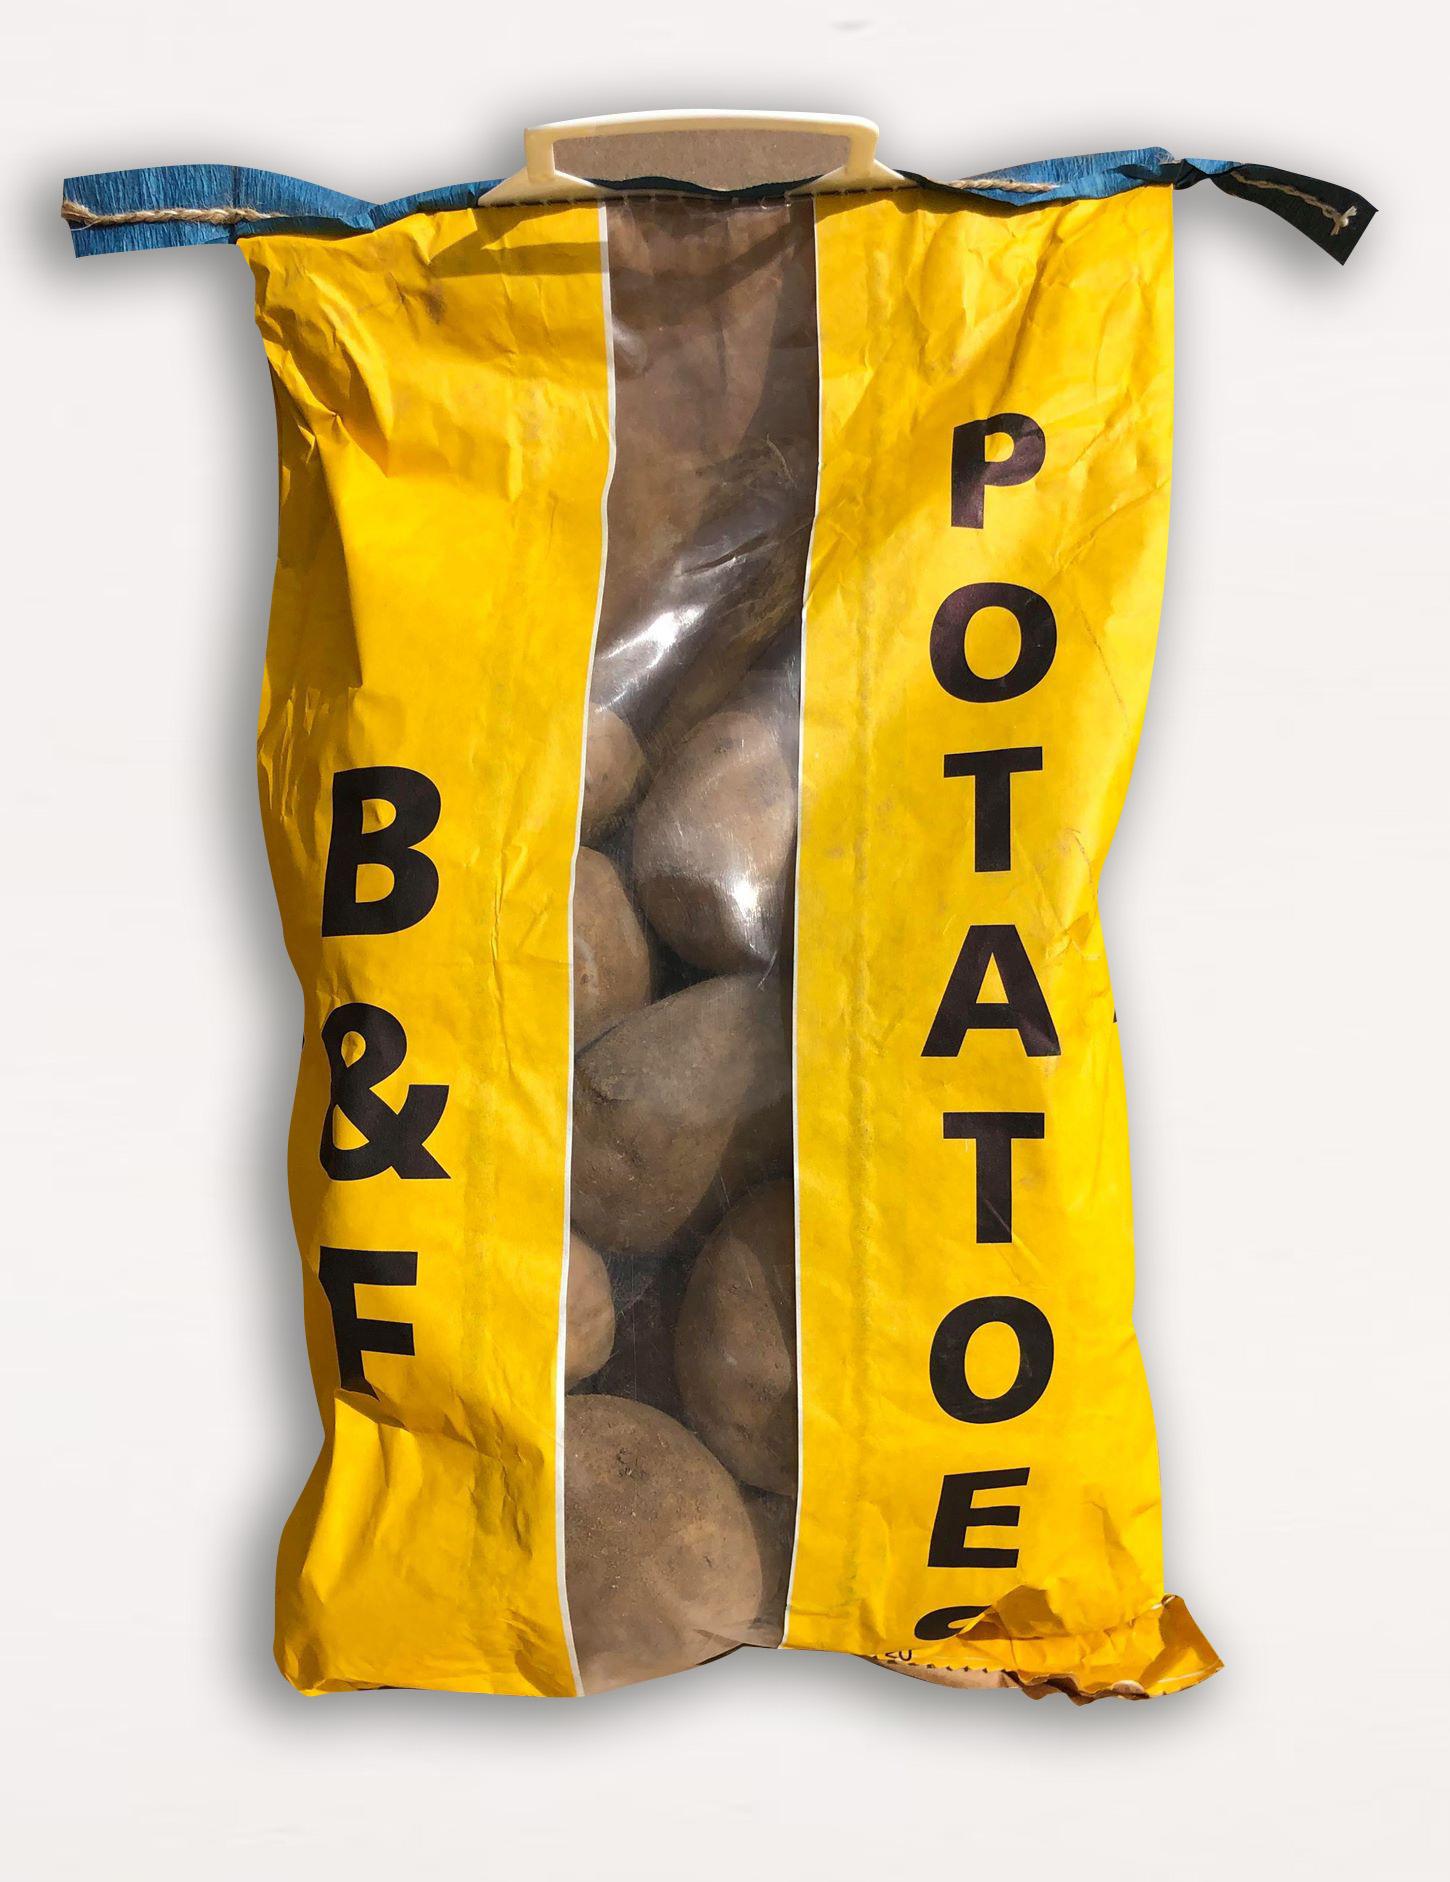 1 x 7.5Kg Loose Potatoes